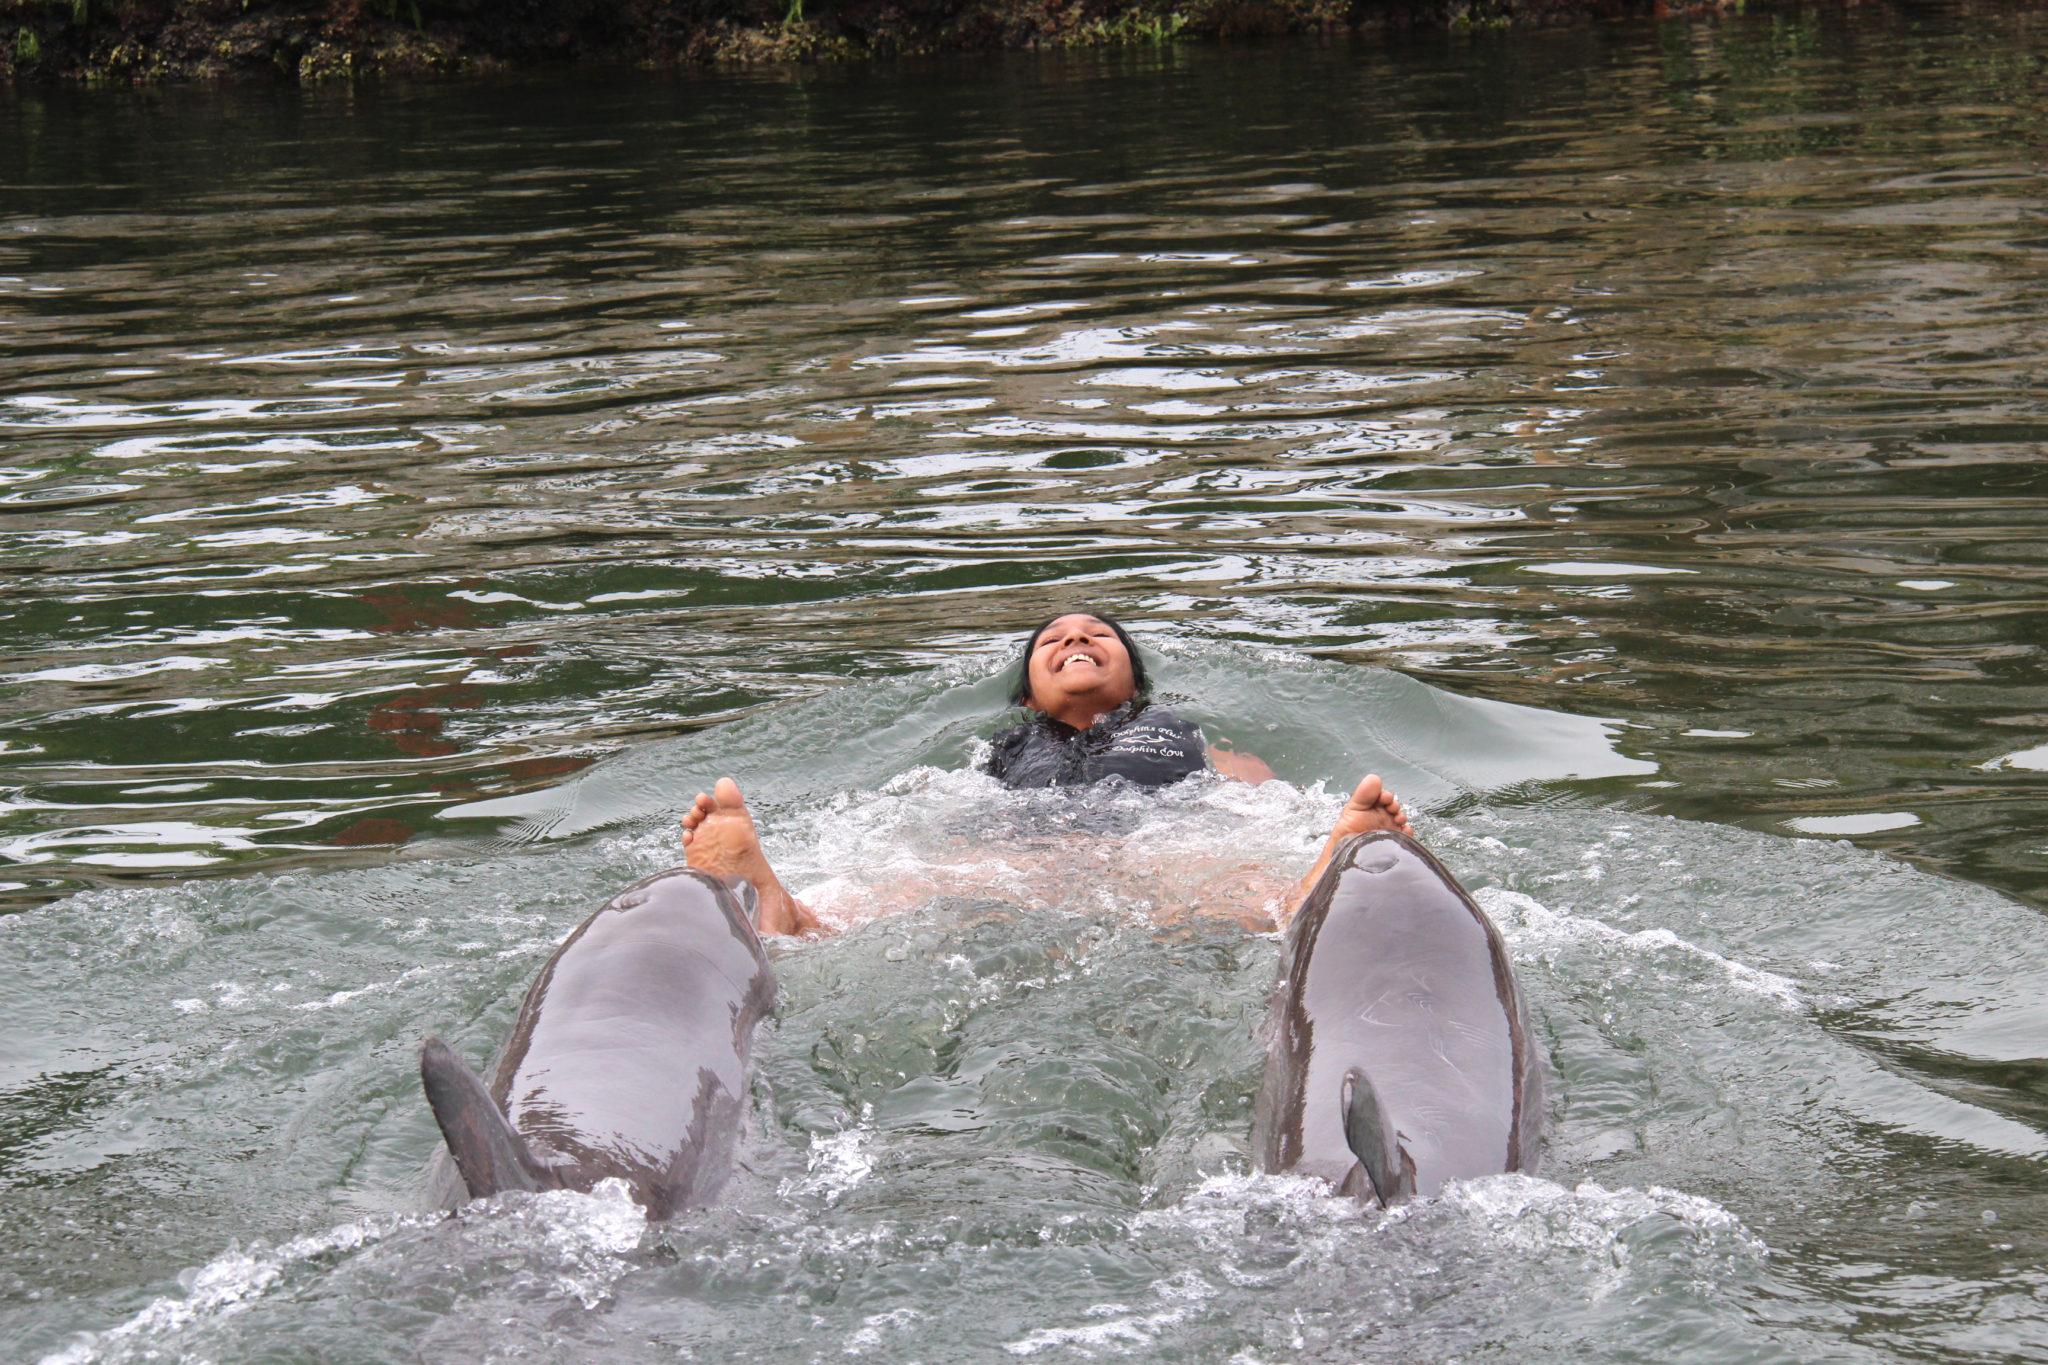 Hema_nager_avec_les_dauphins_dolphin_plus15